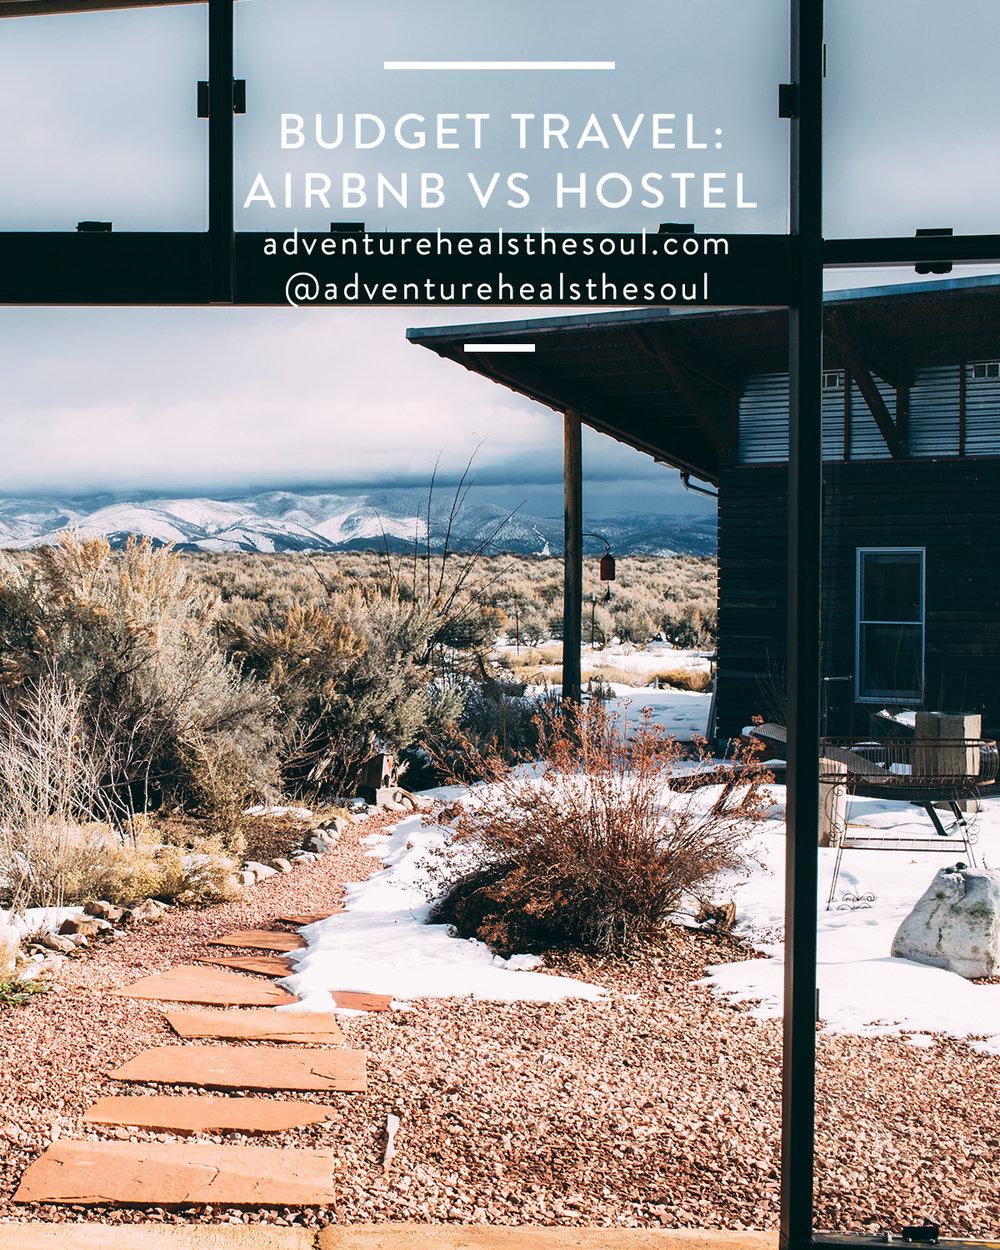 budget-travel-airbnb-hostel.jpg